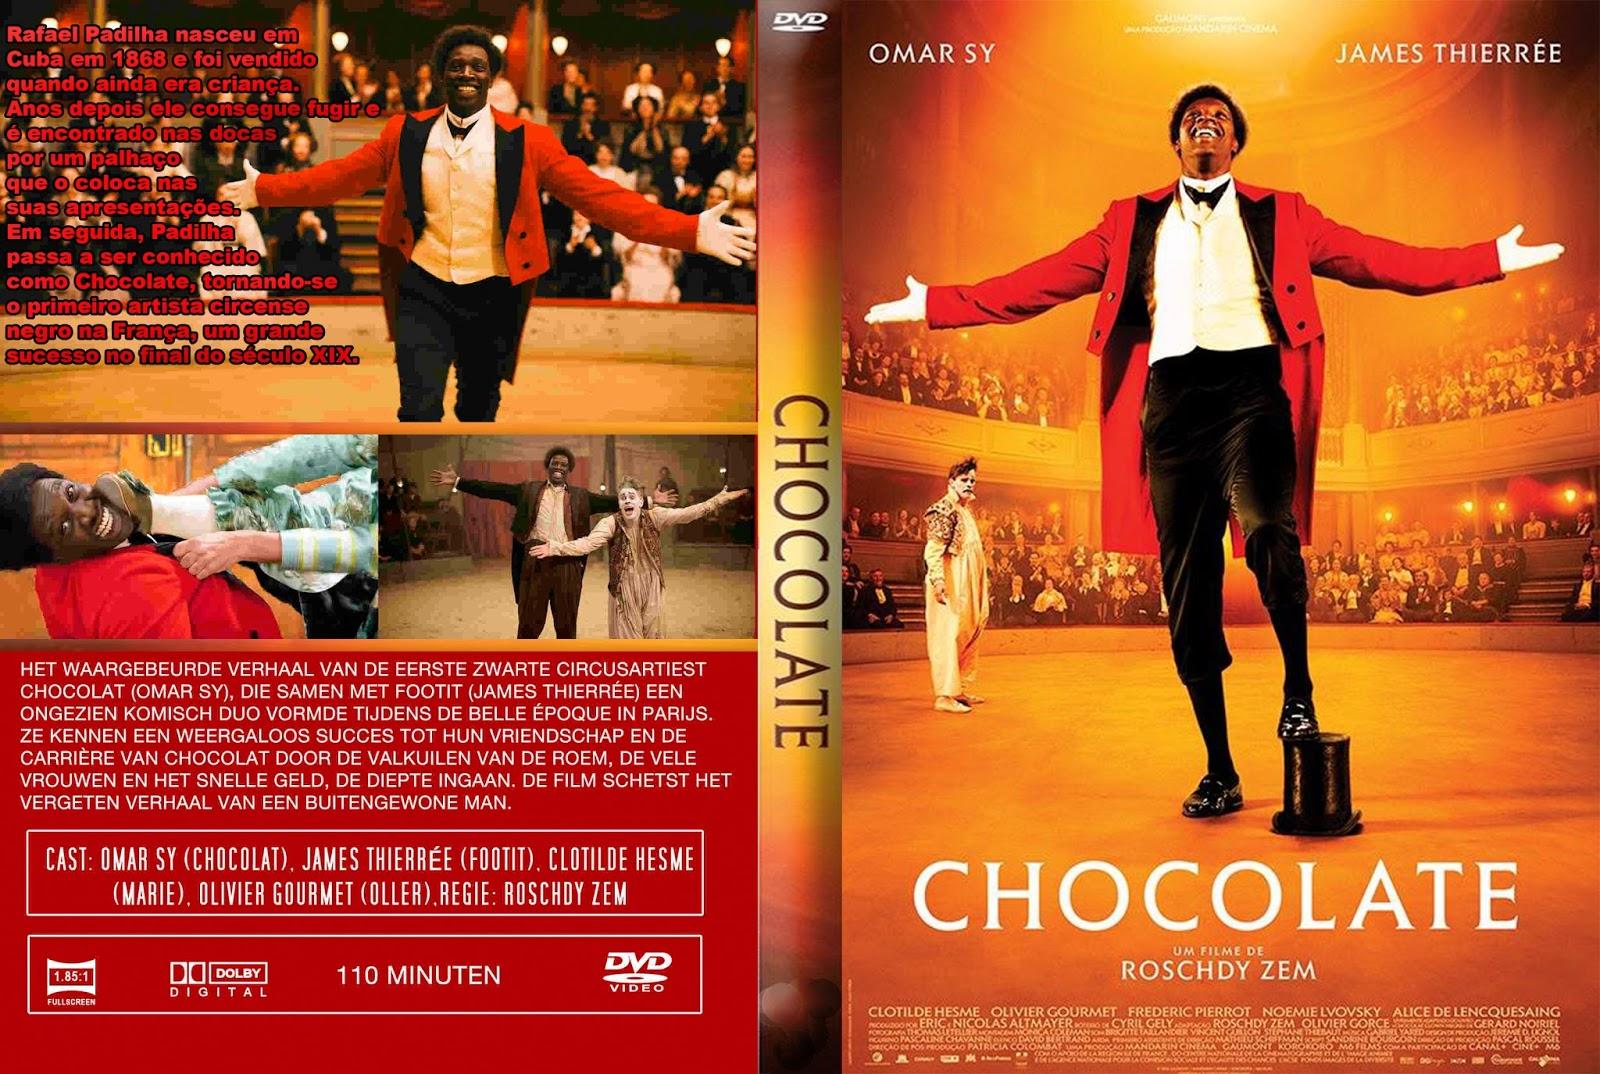 Download Chocolate DVD-R Download Chocolate DVD-R Chocolate 2B  2BXANDAODOWNLOAD